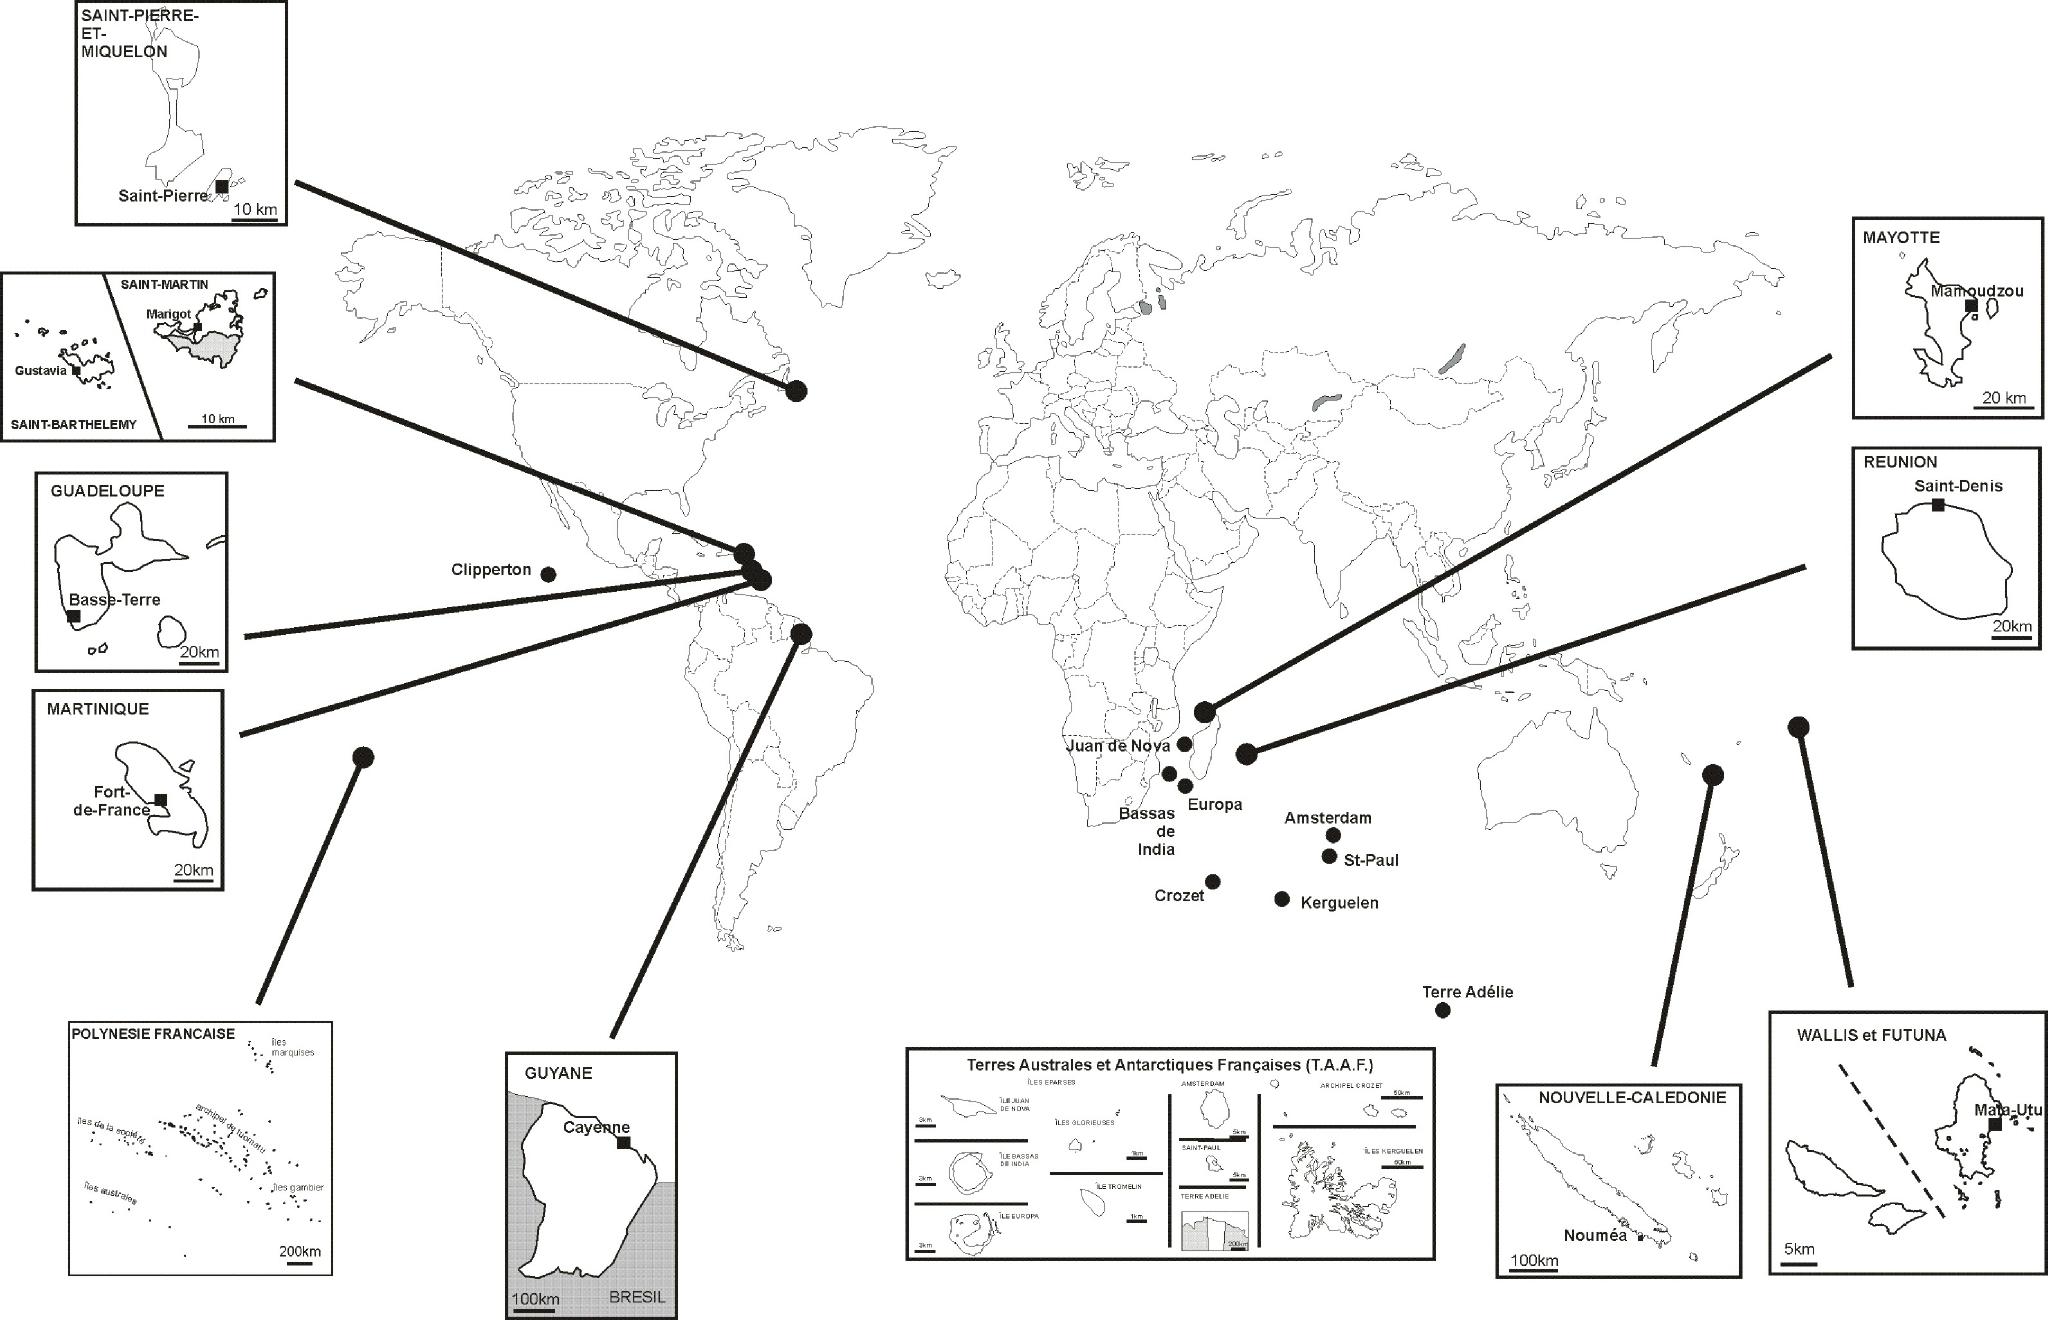 carte des territoires ultramarins français Les territoires ultramarins français – Cyberhistoiregeo Carto